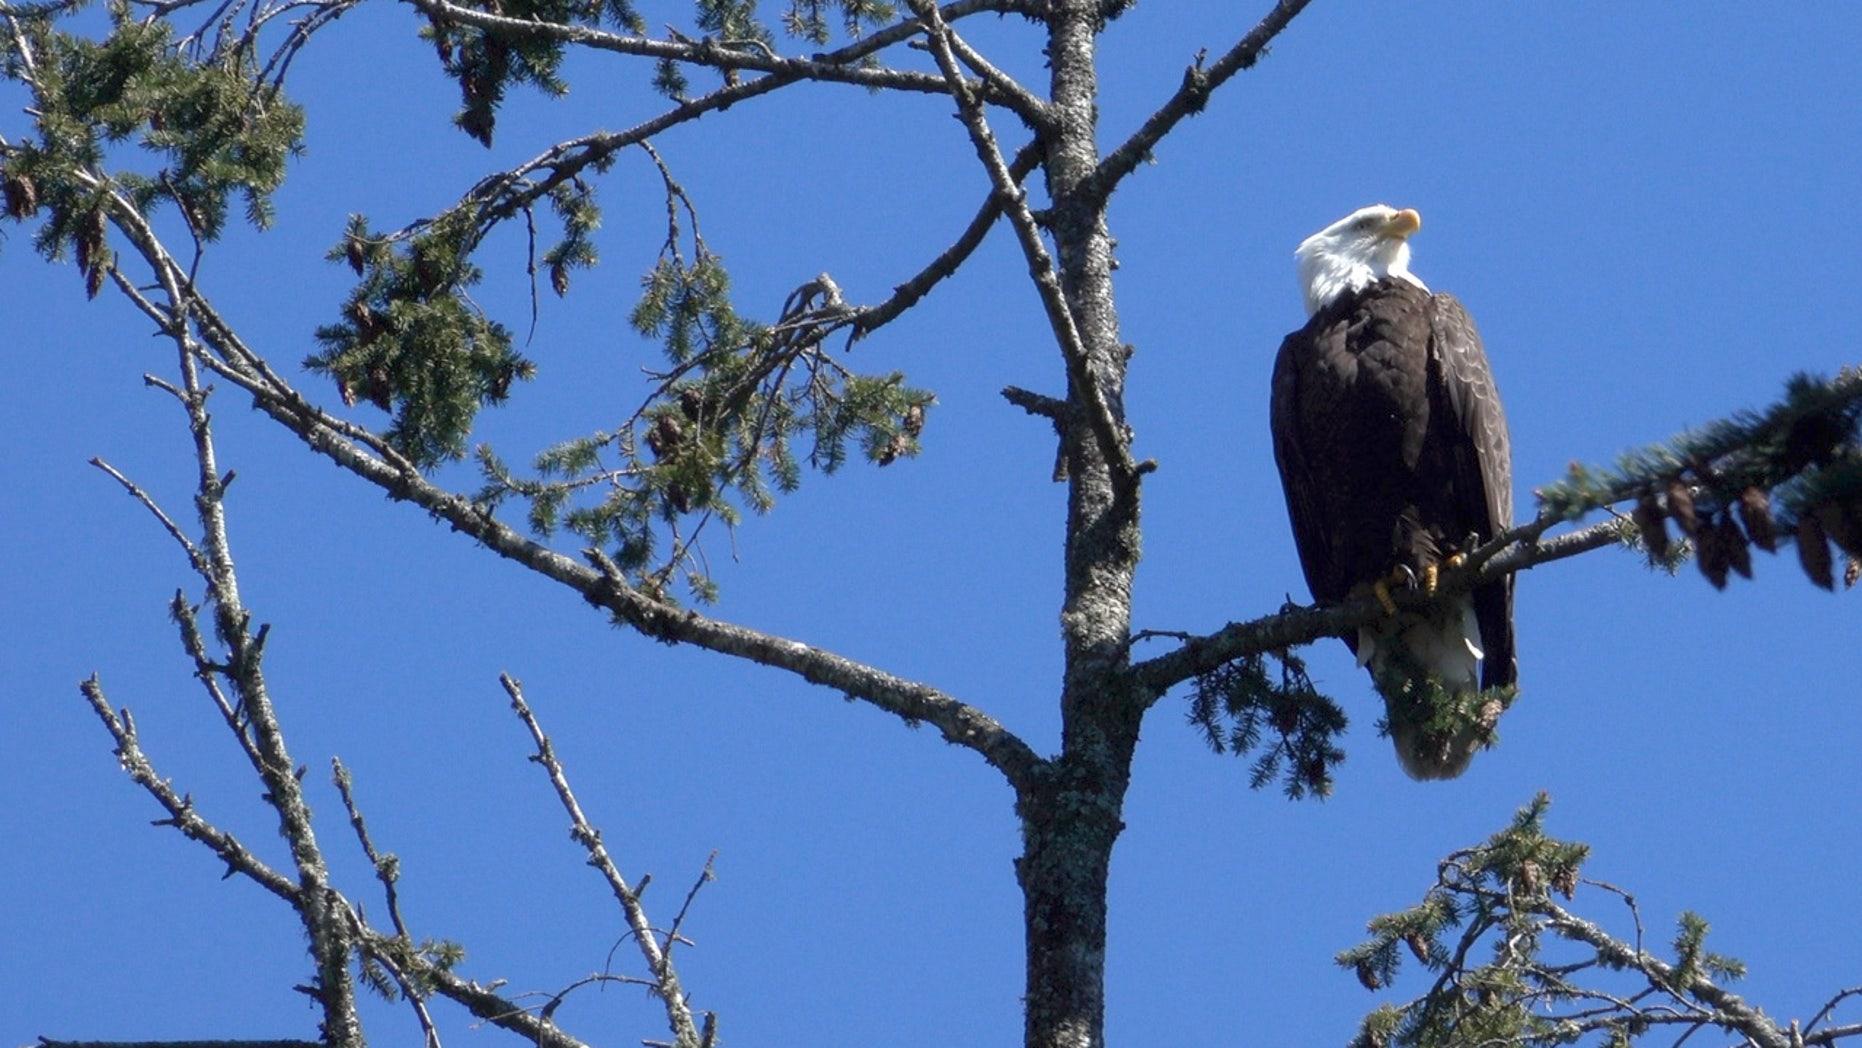 A wild bald eagle perches in a tree above the Oregon Zoo.